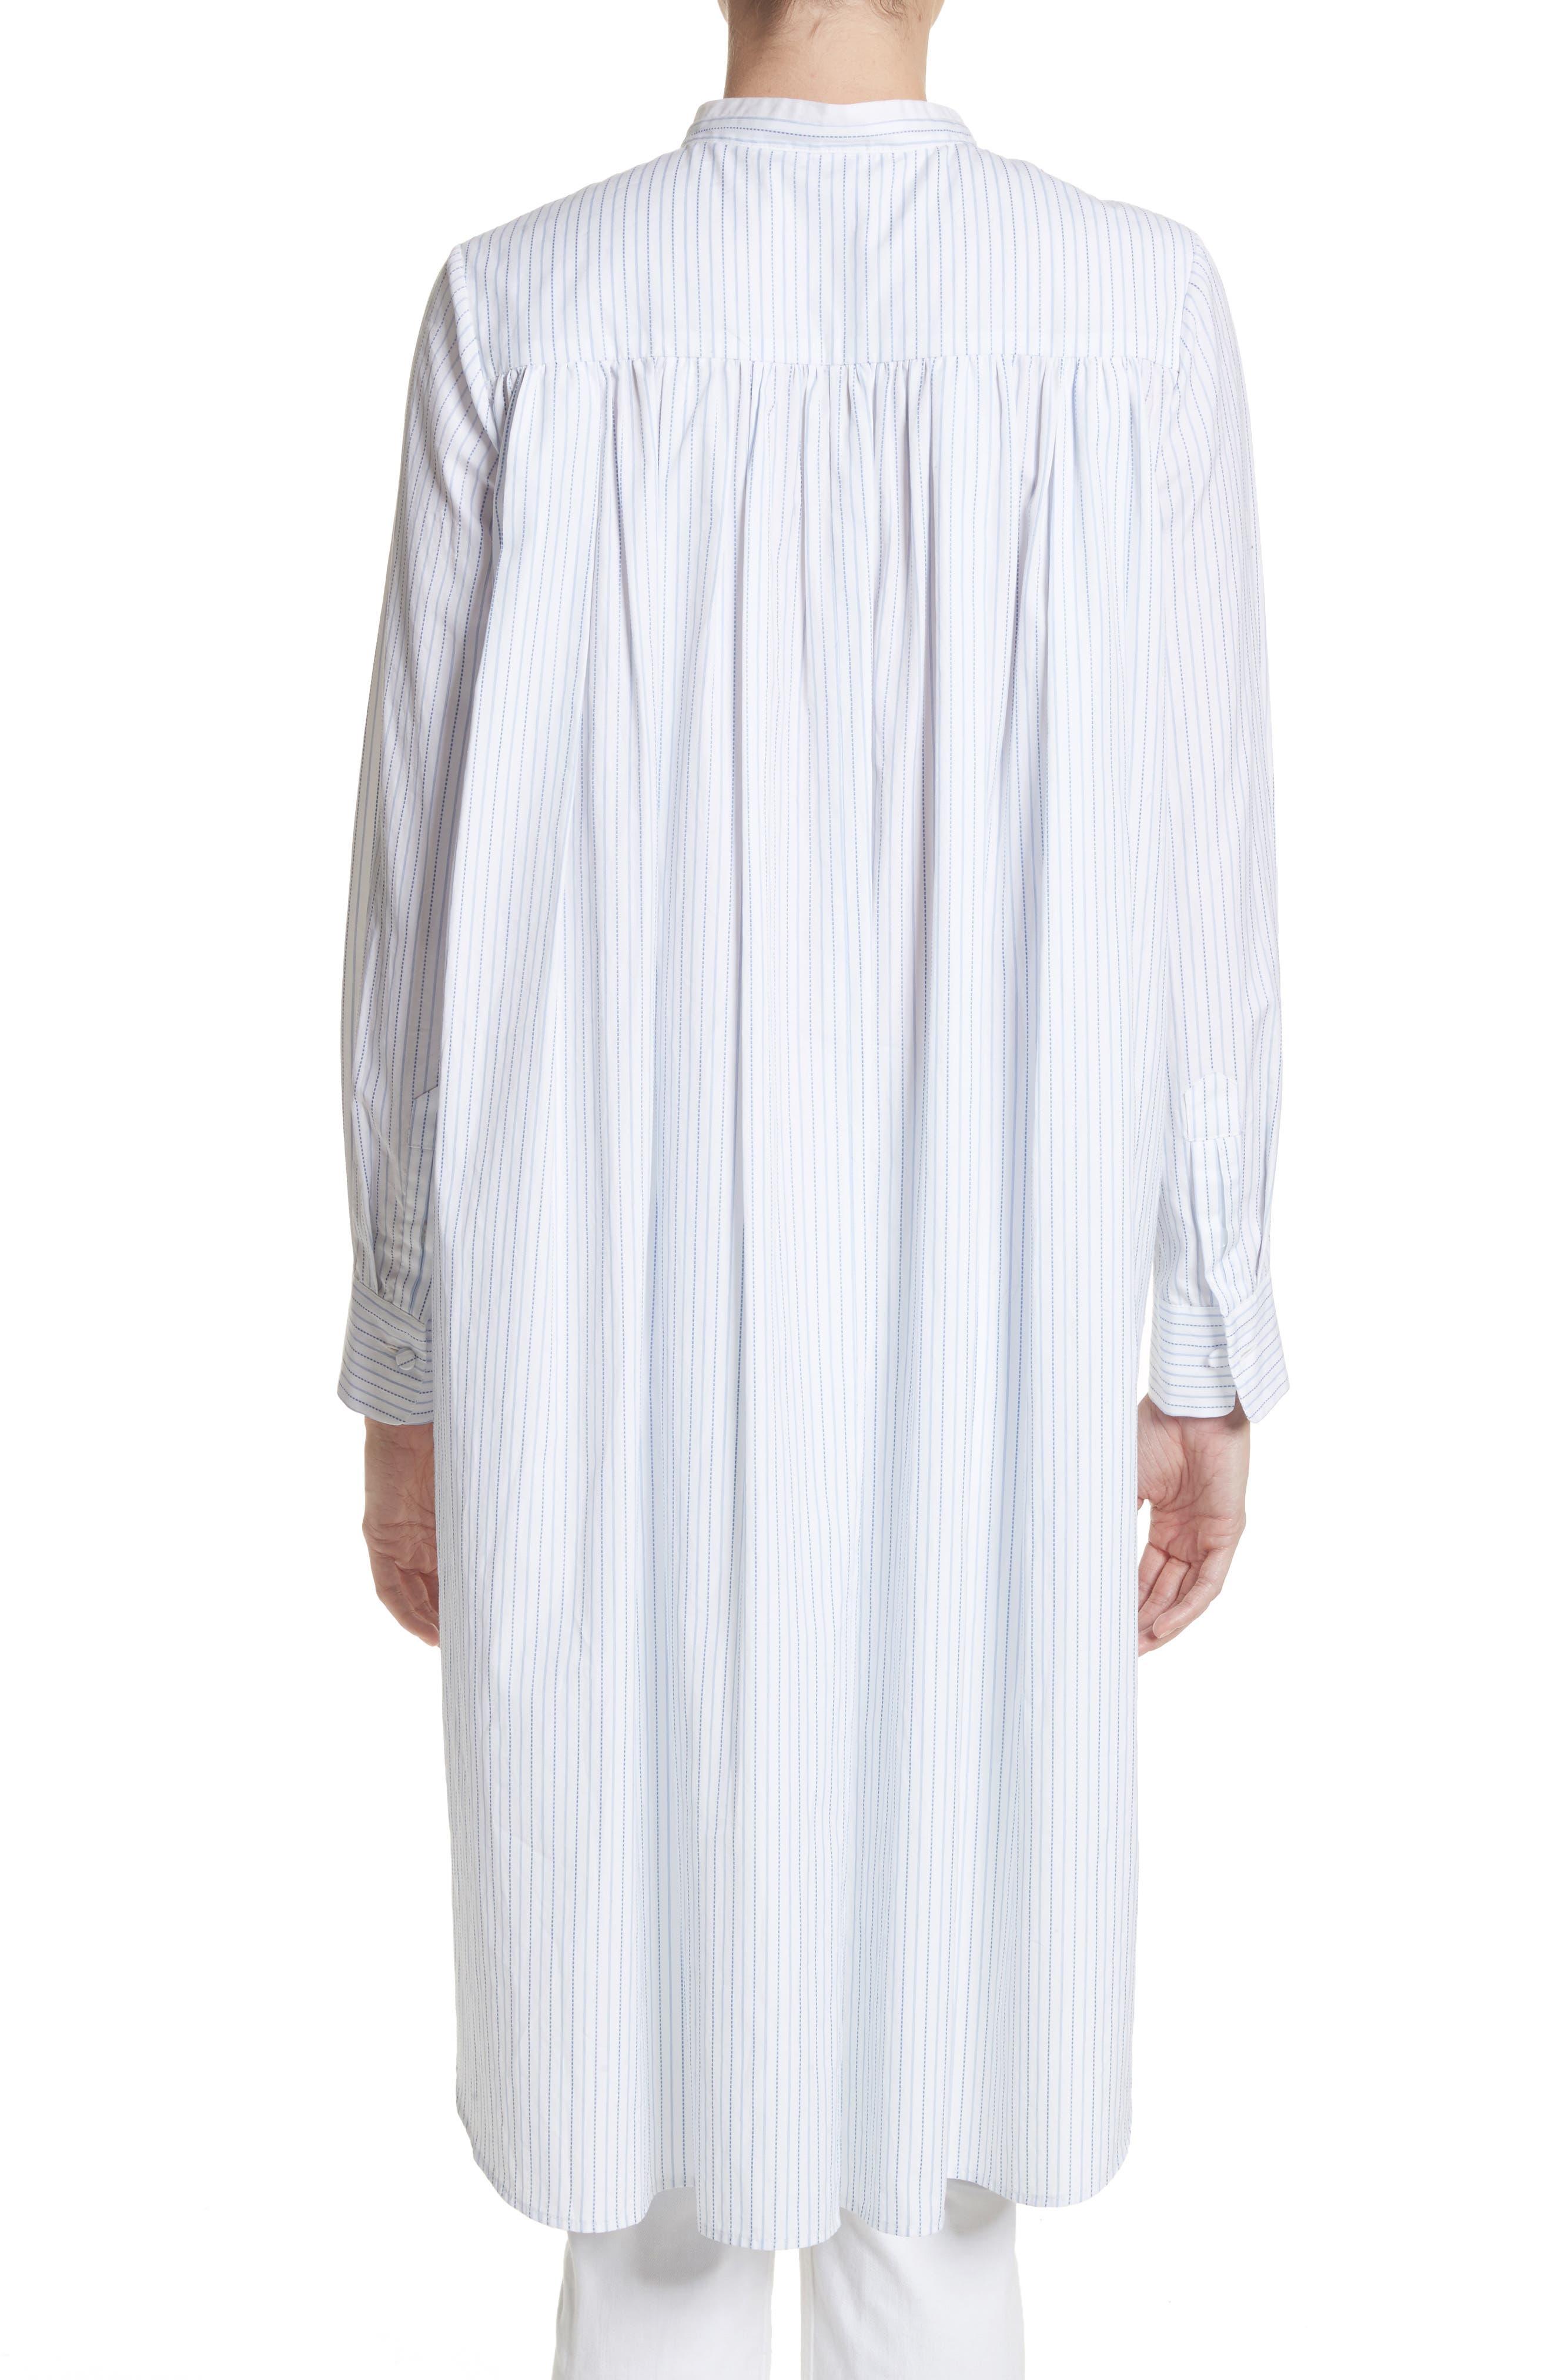 High/Low Stripe Cotton Poplin Shirt,                             Alternate thumbnail 2, color,                             110